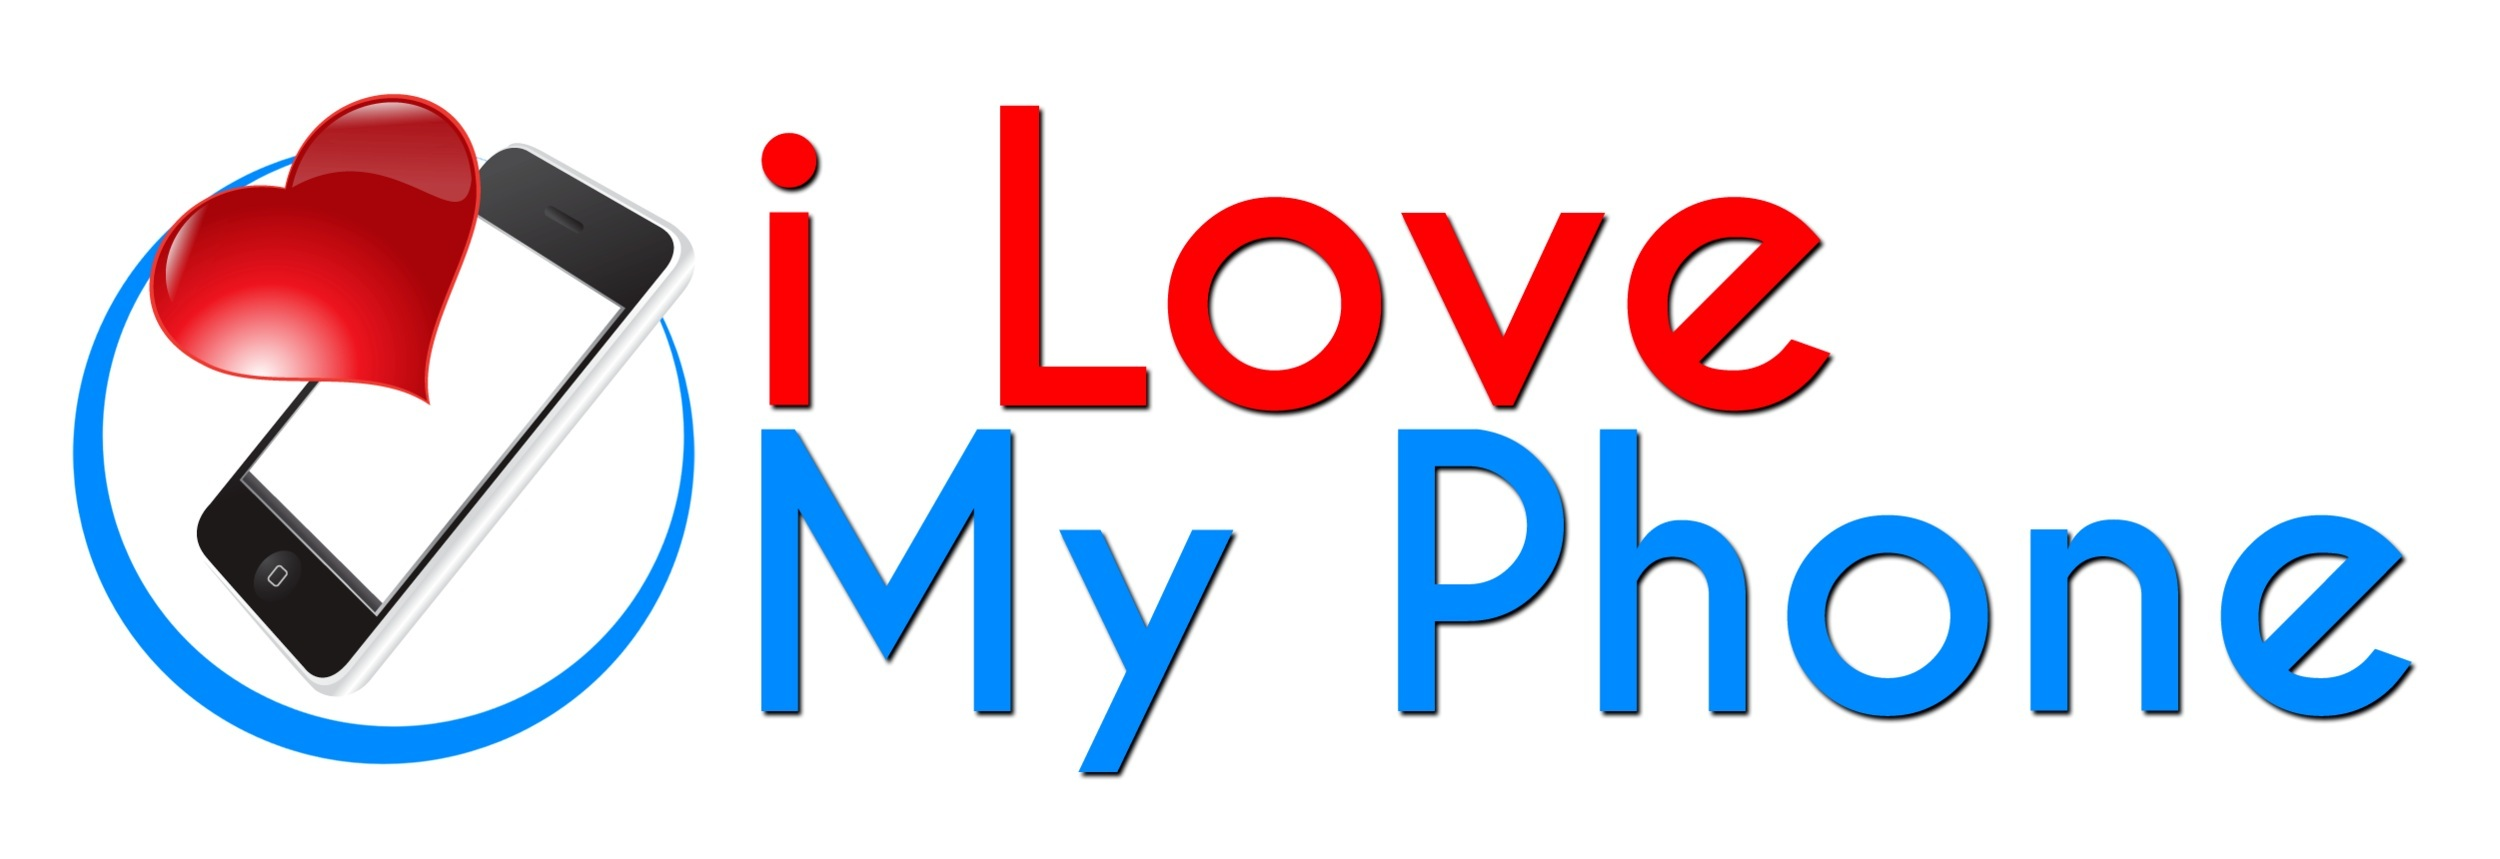 ilove my phone 2.png